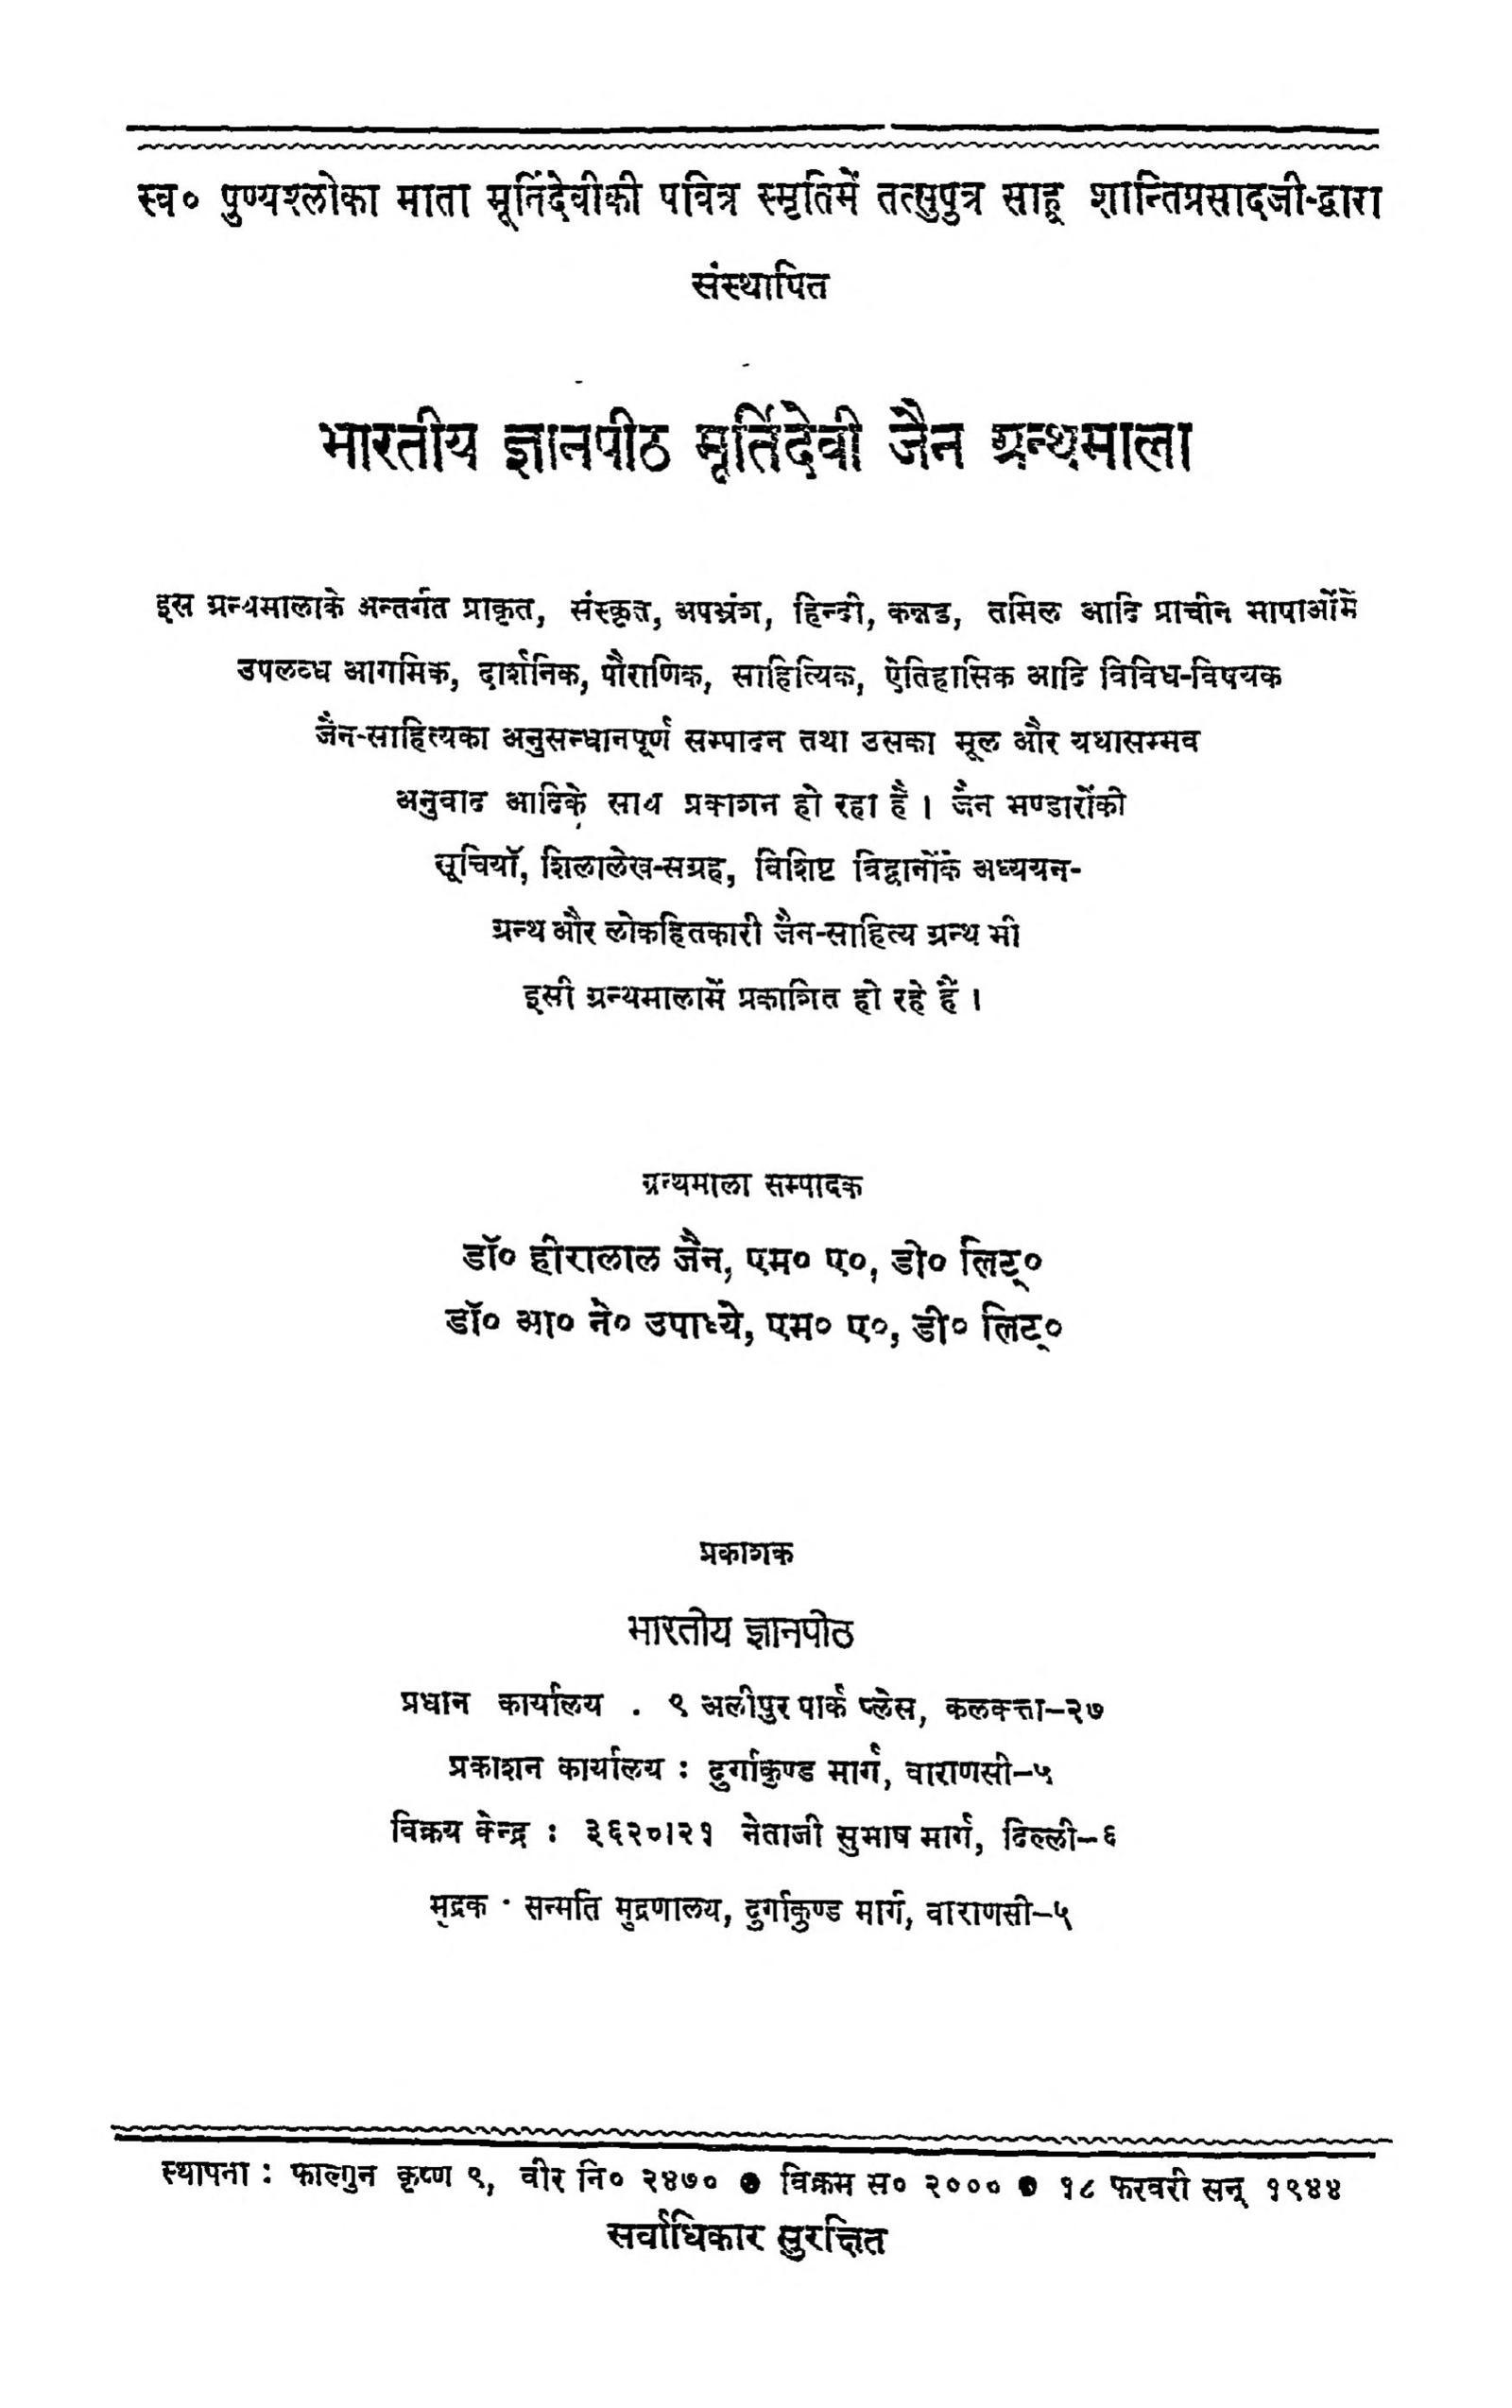 Bhartiya Gyanpith Murtidevi Jain Granthmala by डॉ हीरालाल जैन - Dr. Hiralal Jain